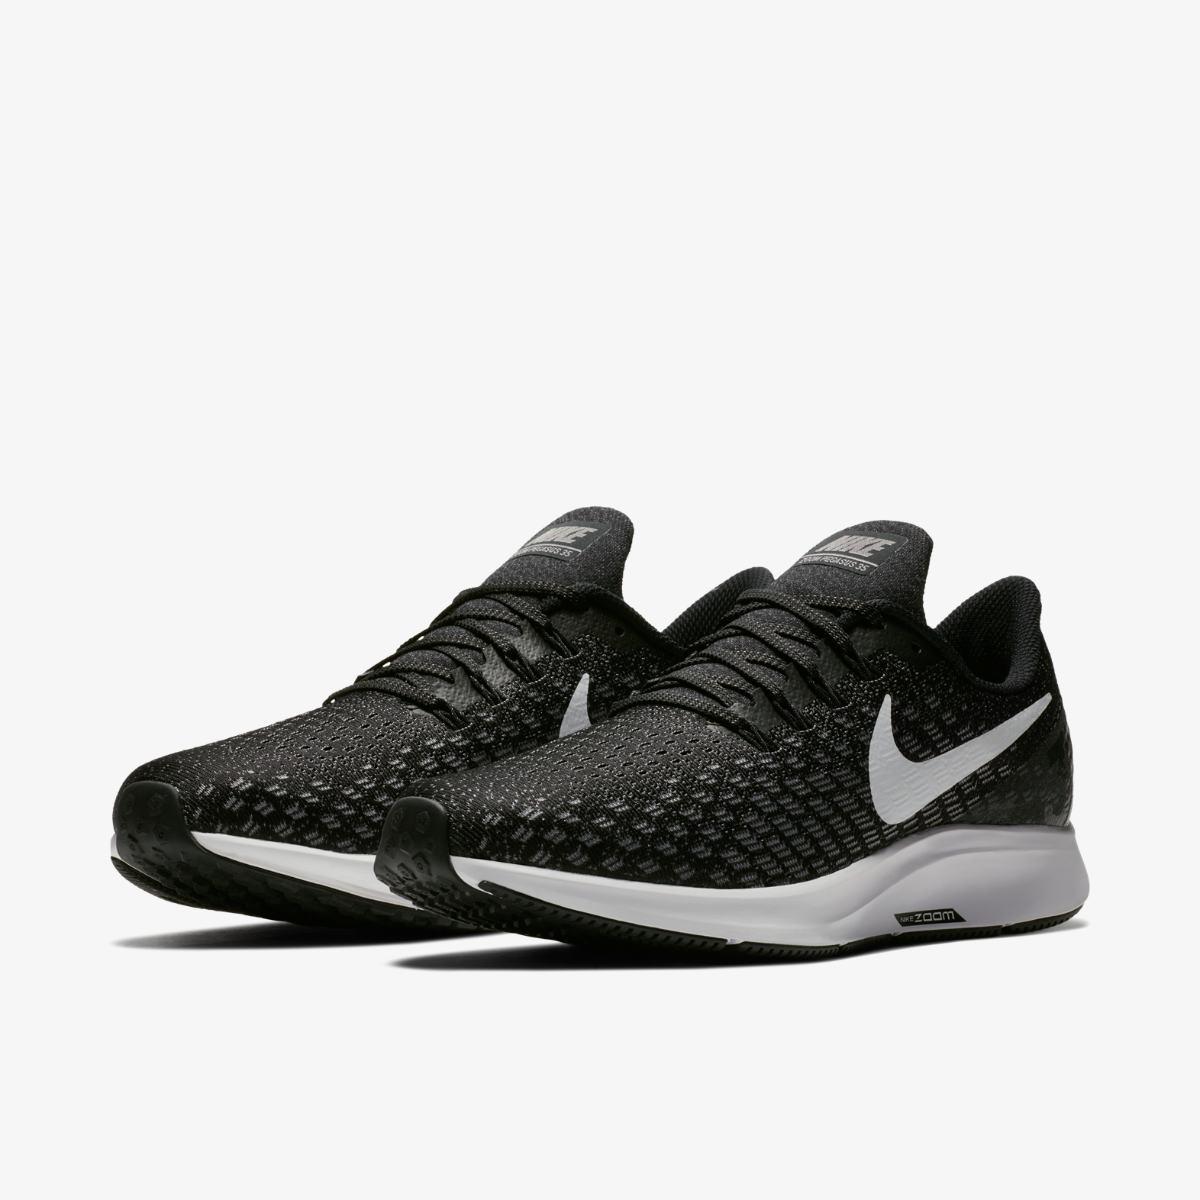 fd7685e7 Кроссовки для бега Nike AIR ZOOM PEGASUS 35 942851-001 купить ...